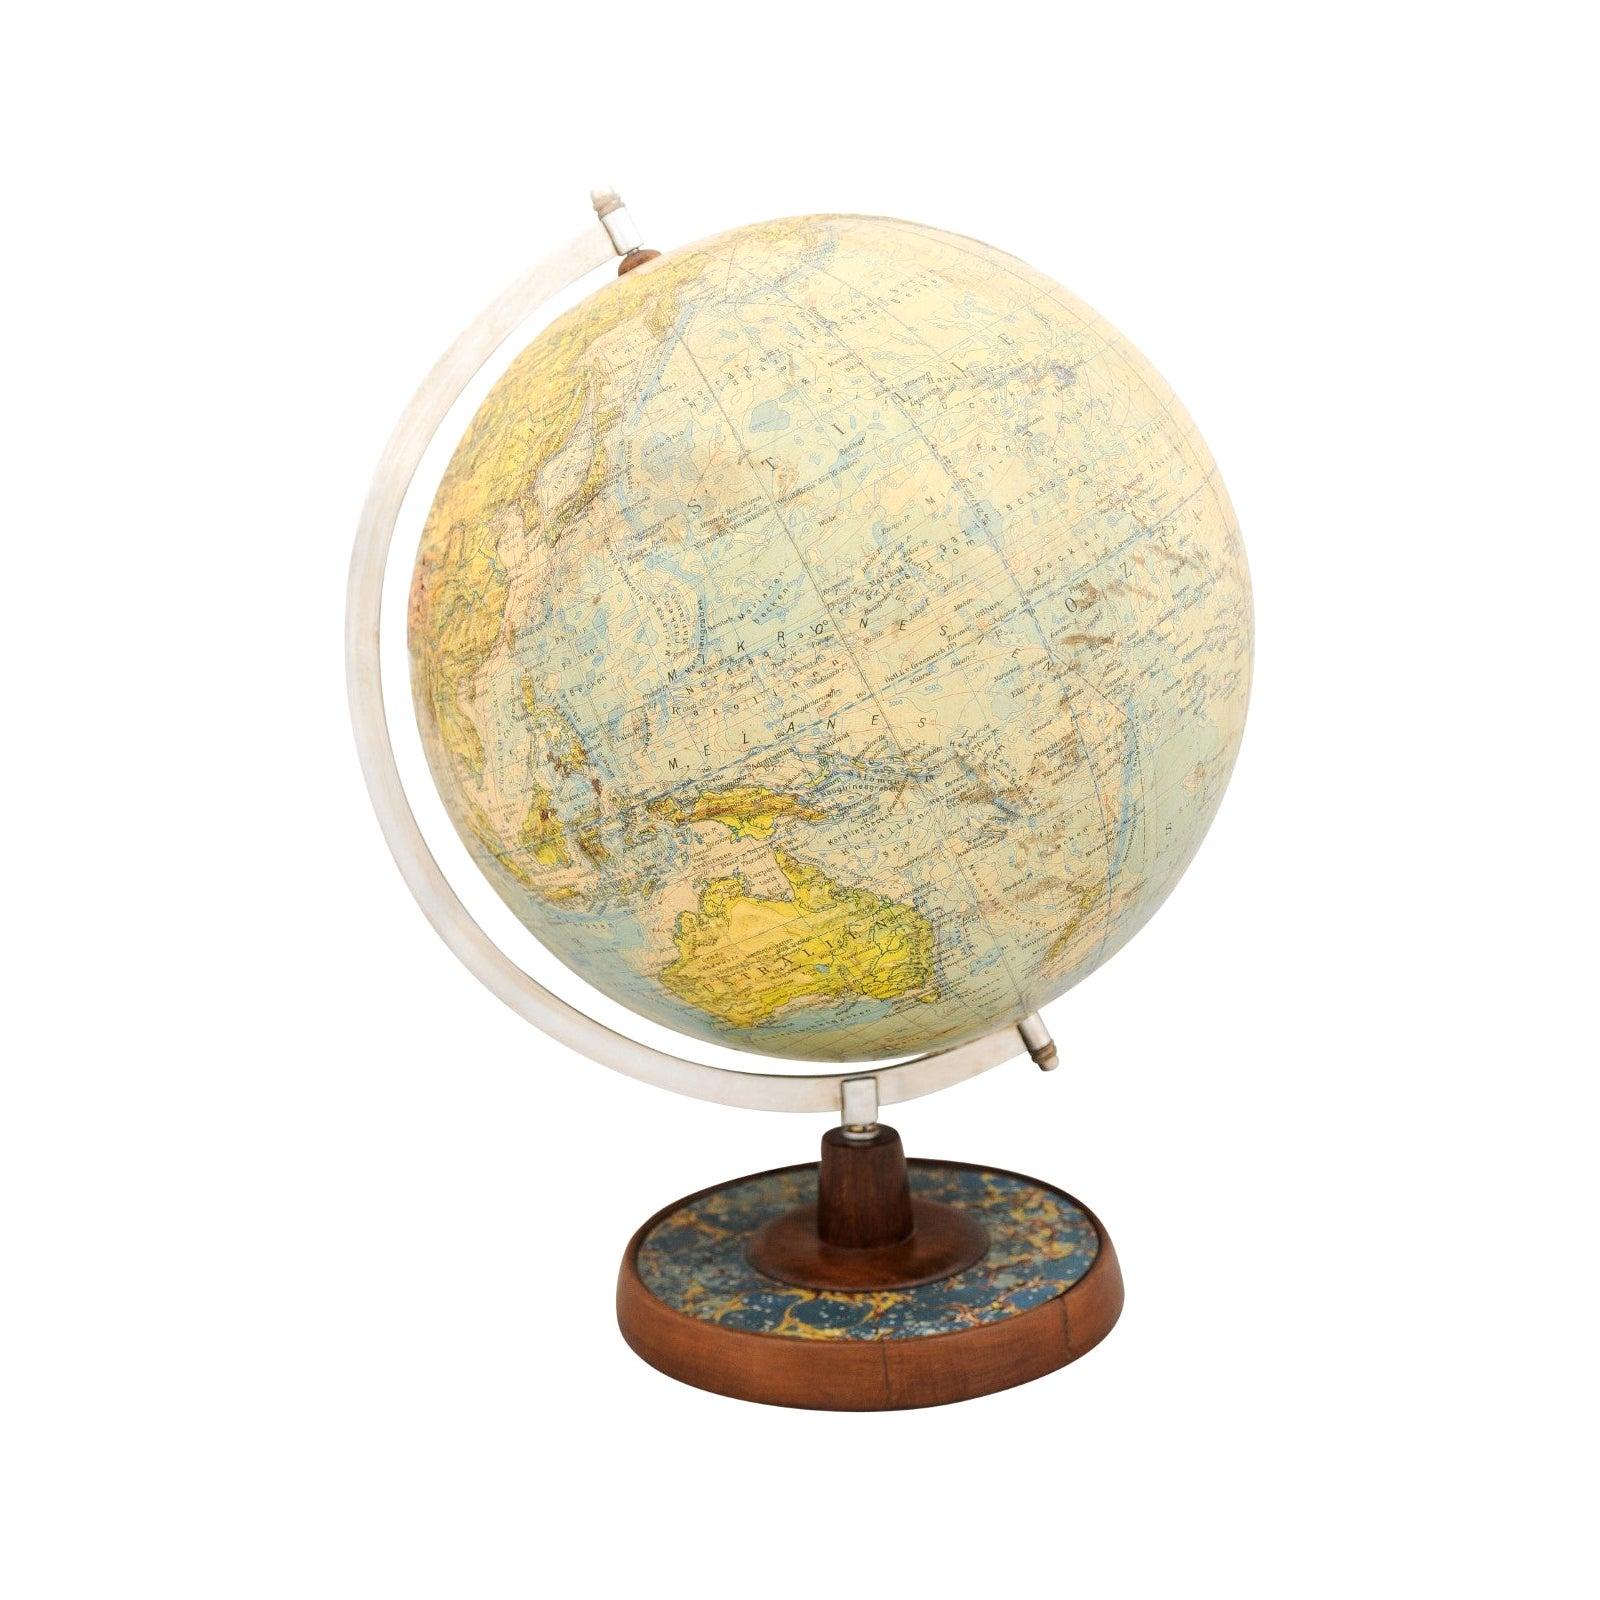 German 1890s Terrestrial Globe on Wooden Base Signed Professor Dr. Arthur Krause